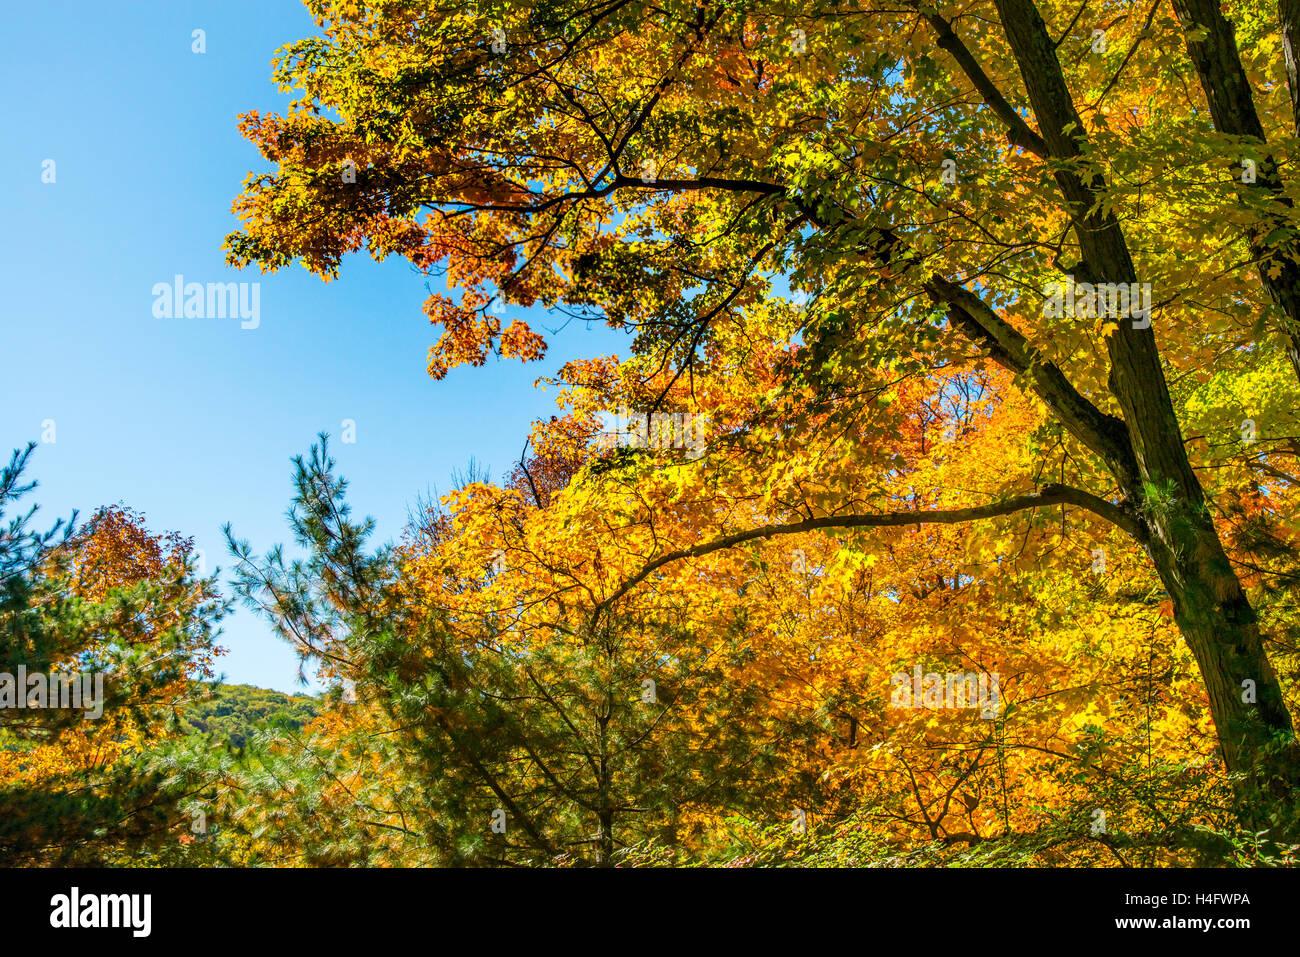 Fall Foliage Harriman State Park New York - Stock Image